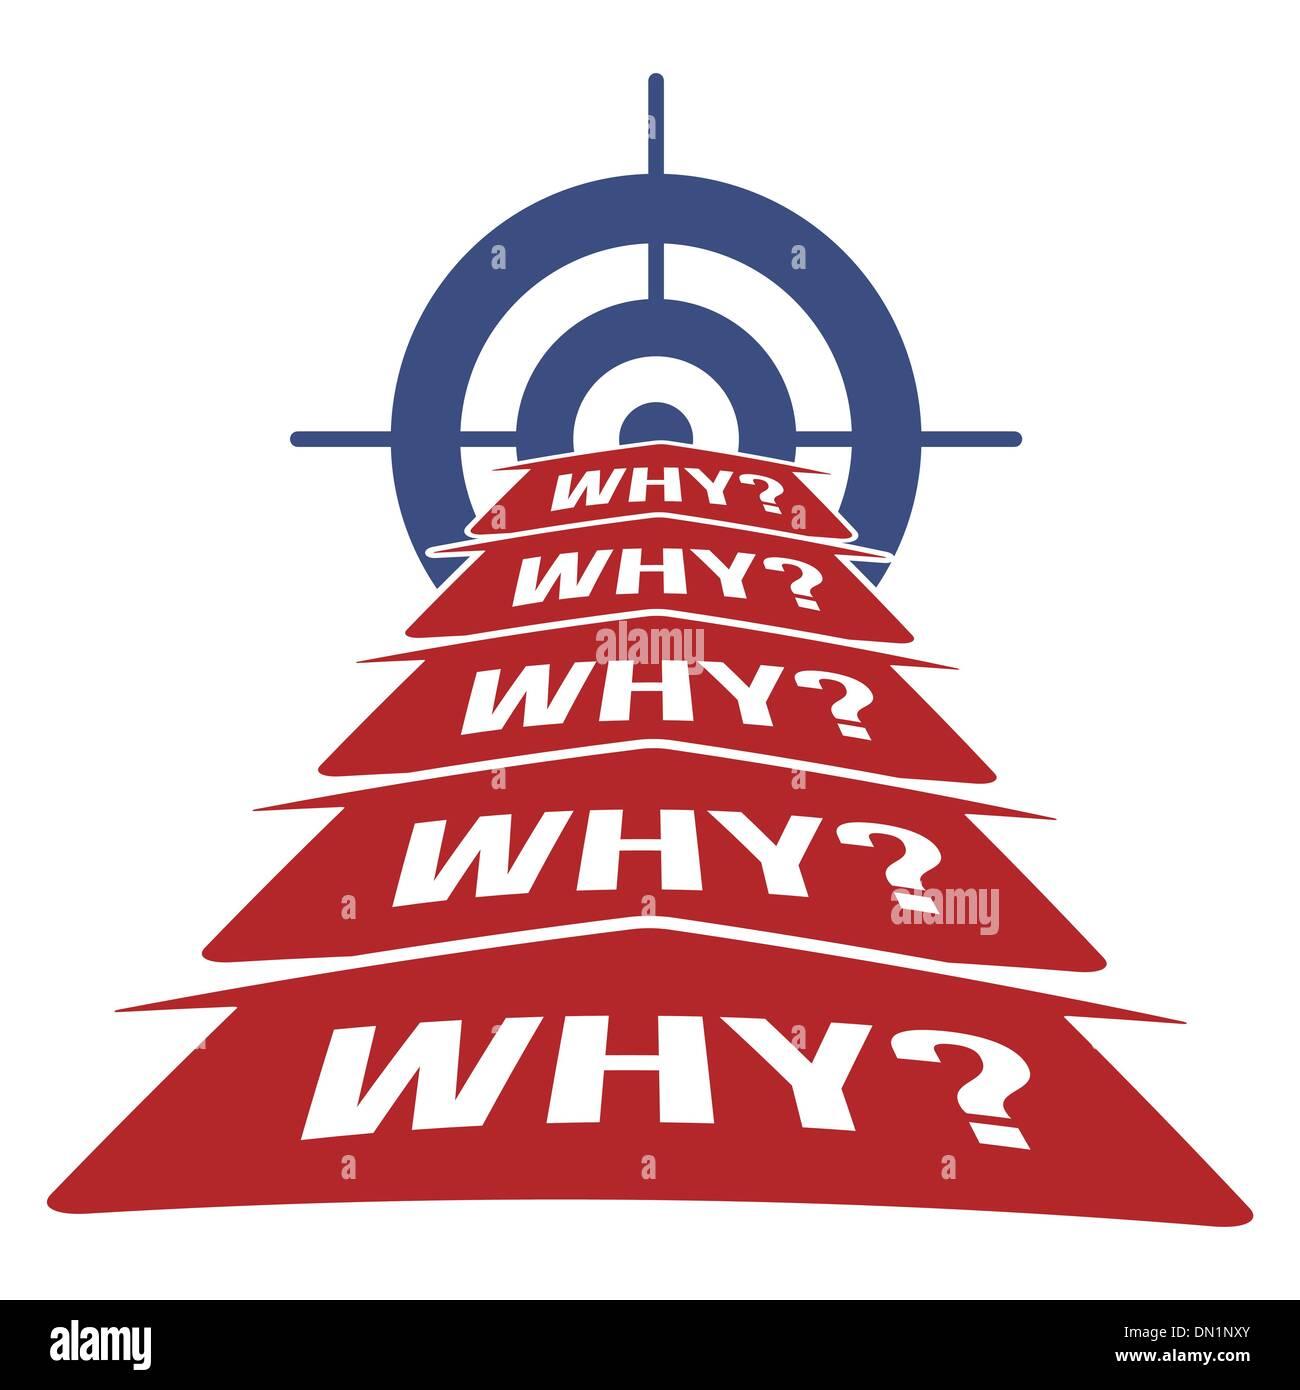 5 Why Methodology Concept Stock Vector Art Amp Illustration